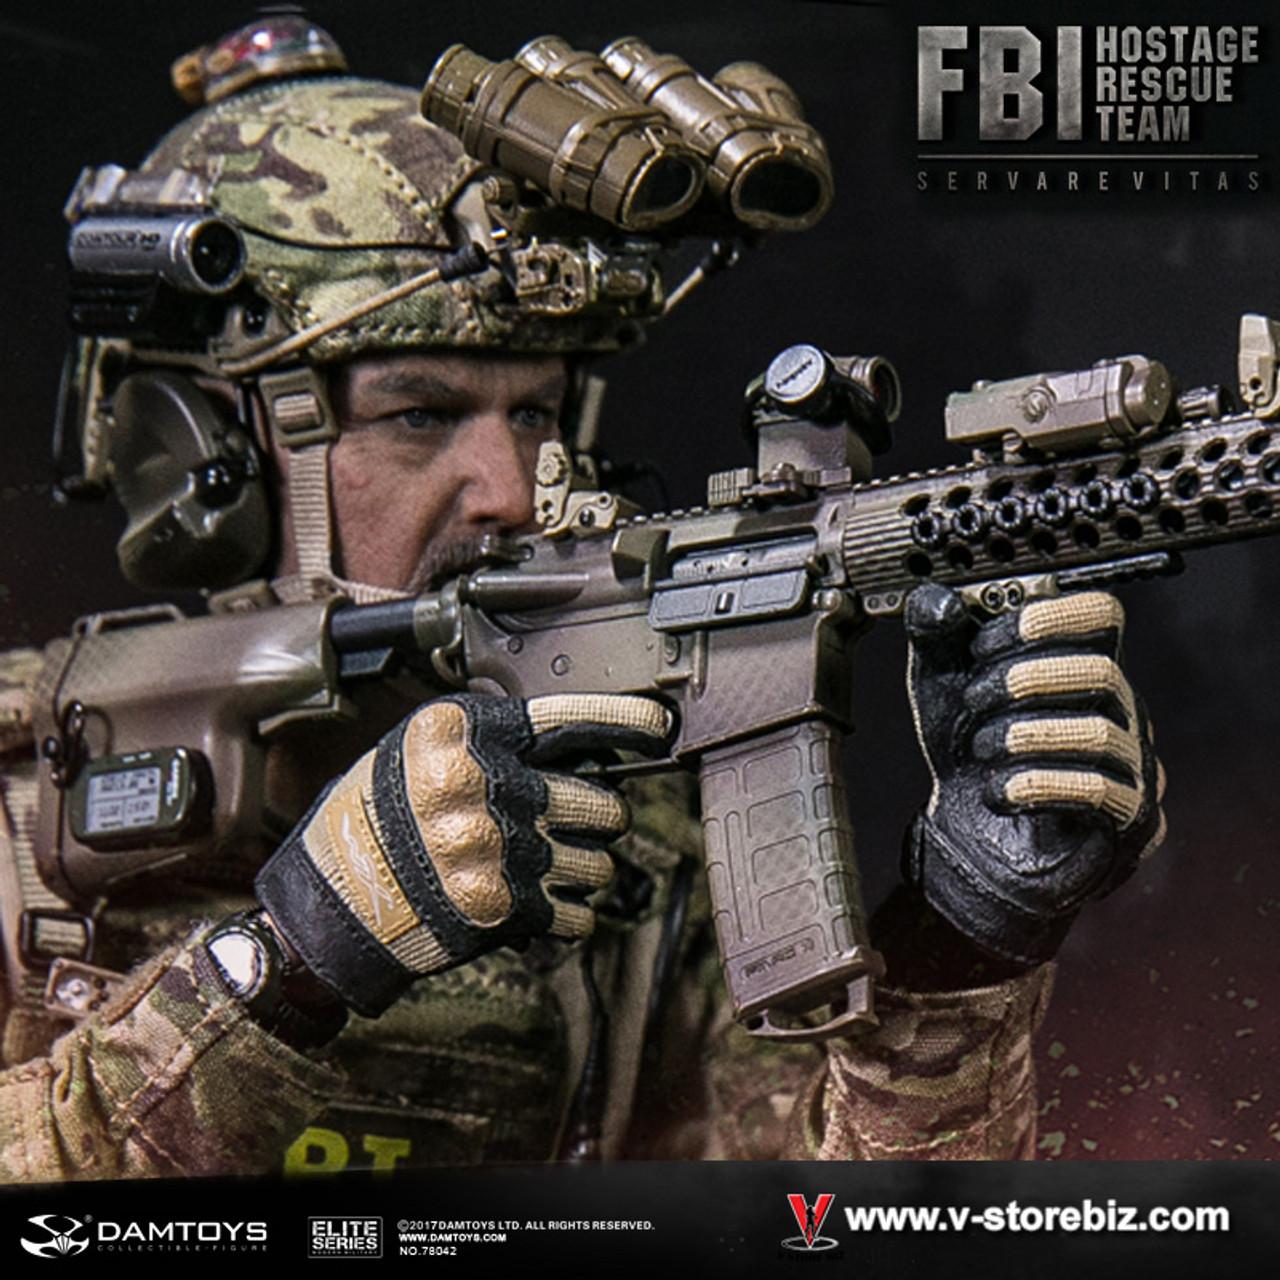 1:6 scale DAM TOYS 78042 FBI HRT AGENT Hostage Rescue Team COMBAT SHIRT